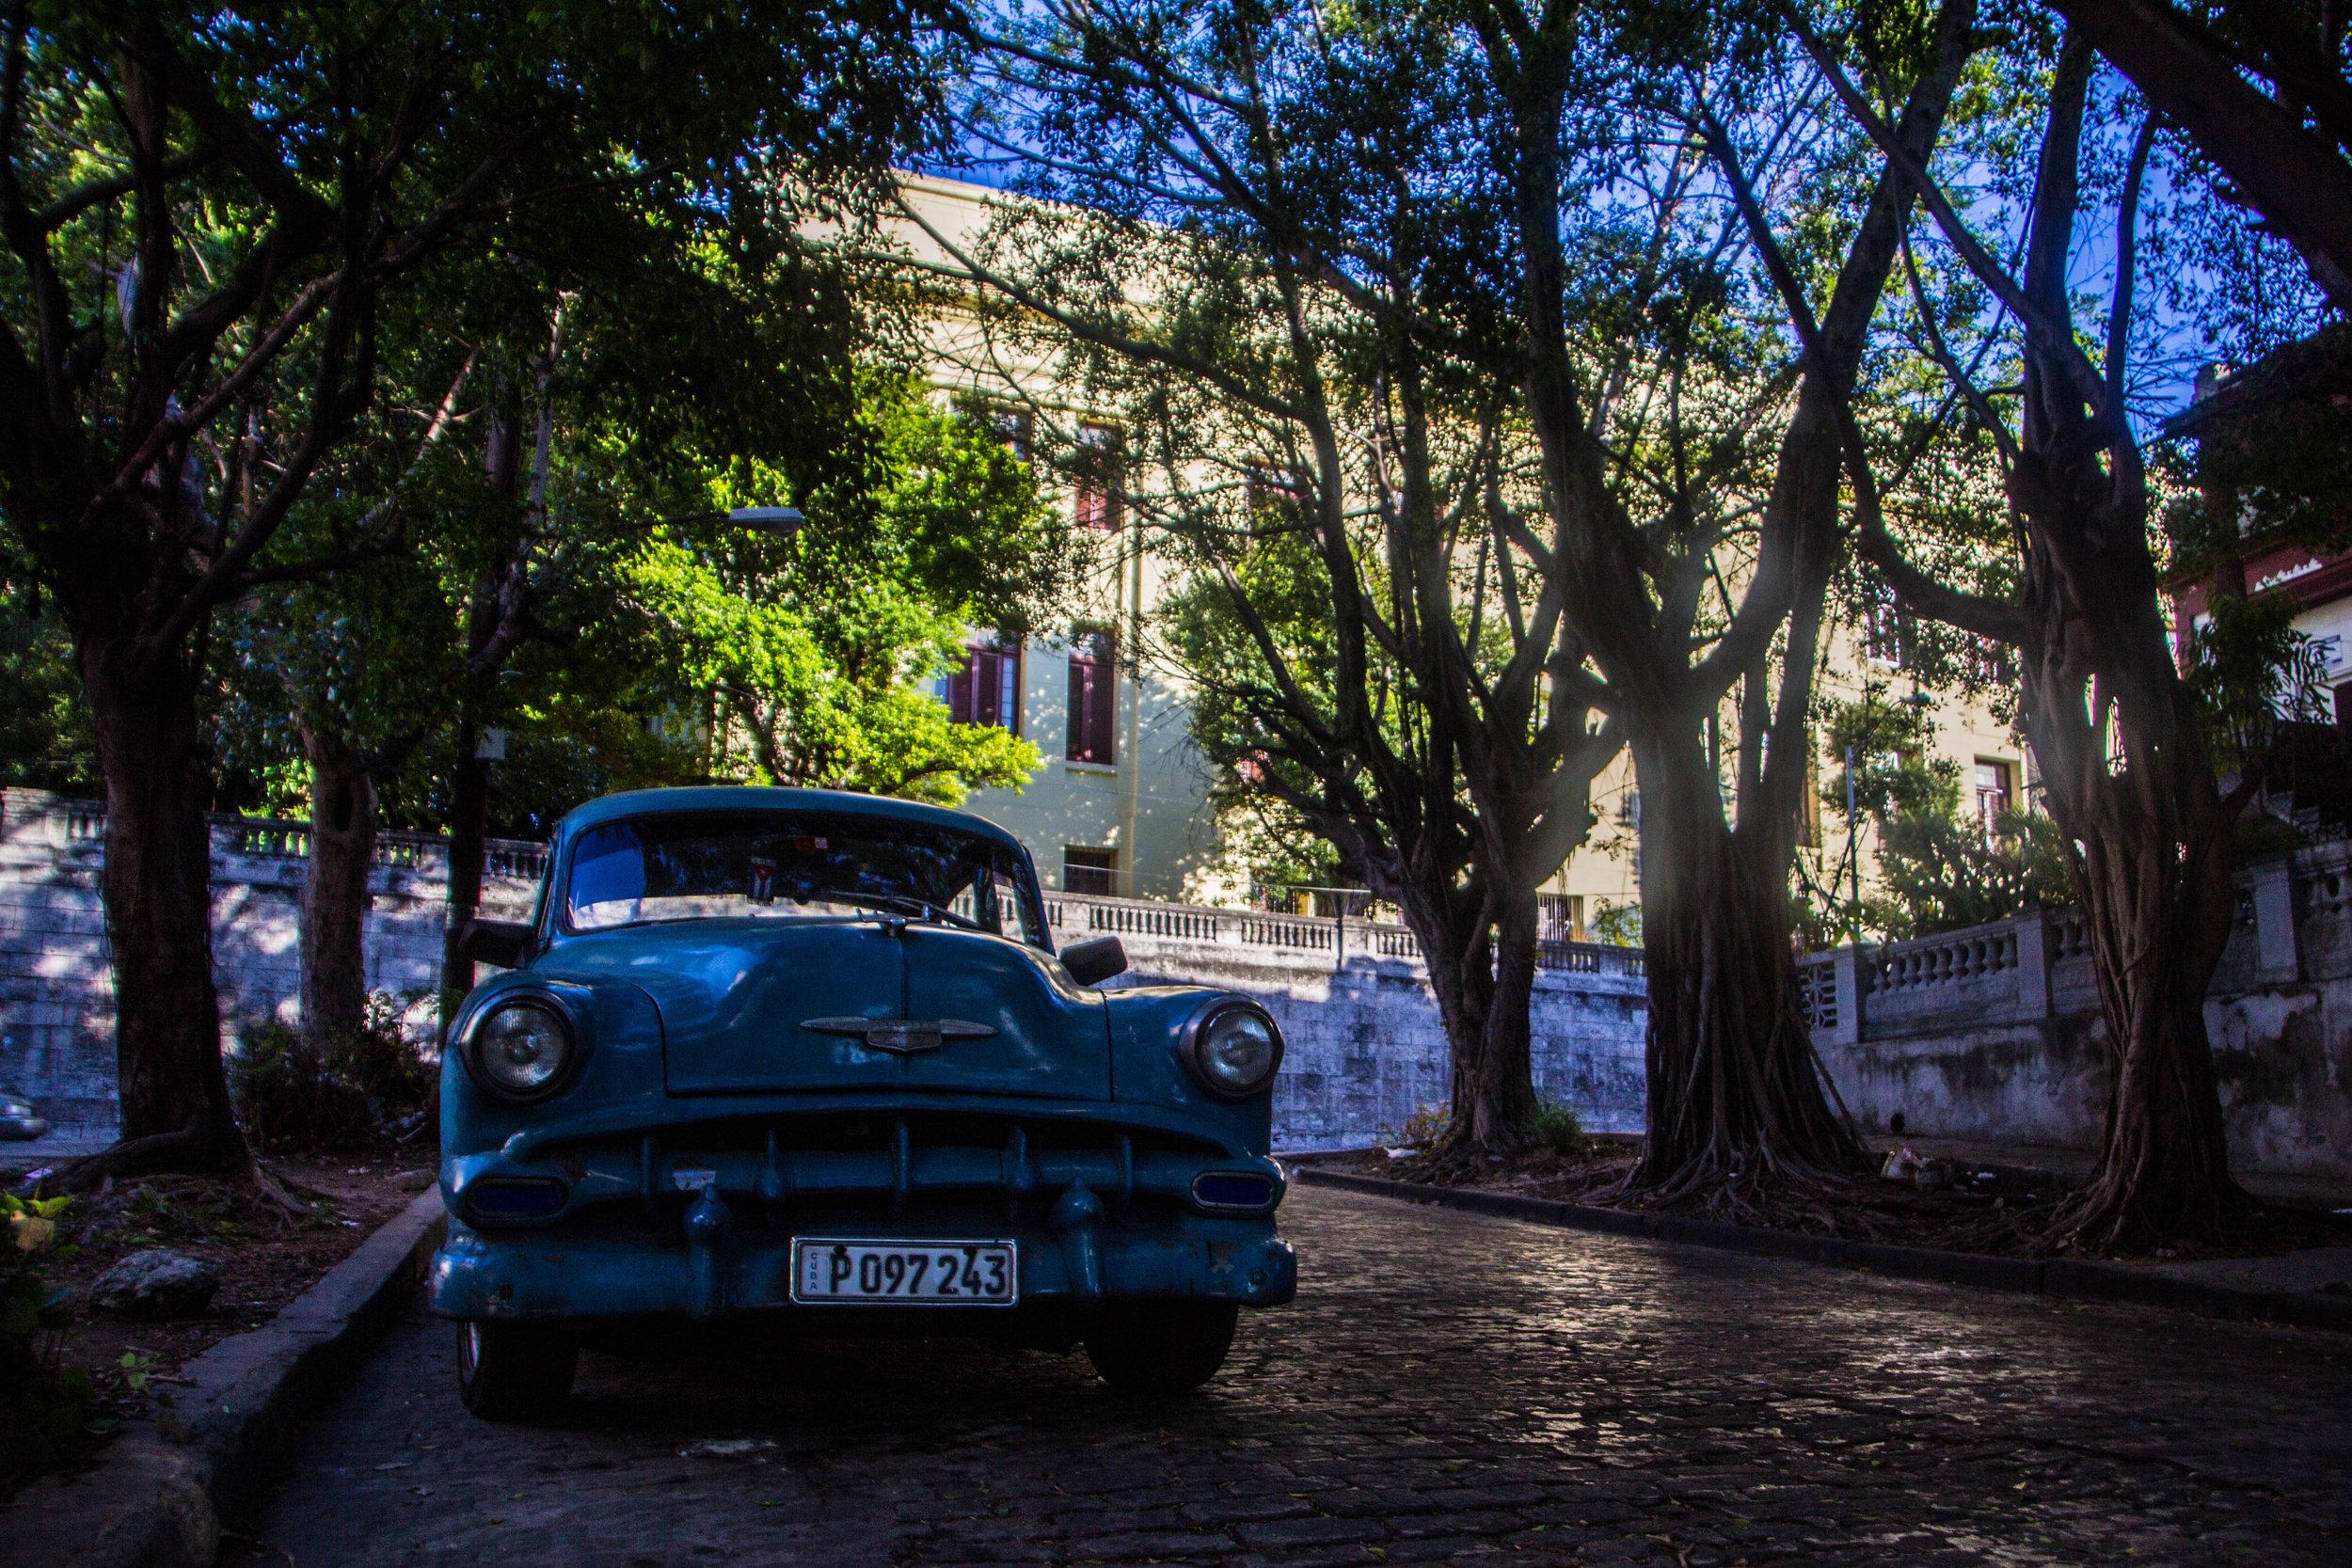 streets near university of havana vedado cuba-1-2-2.jpg